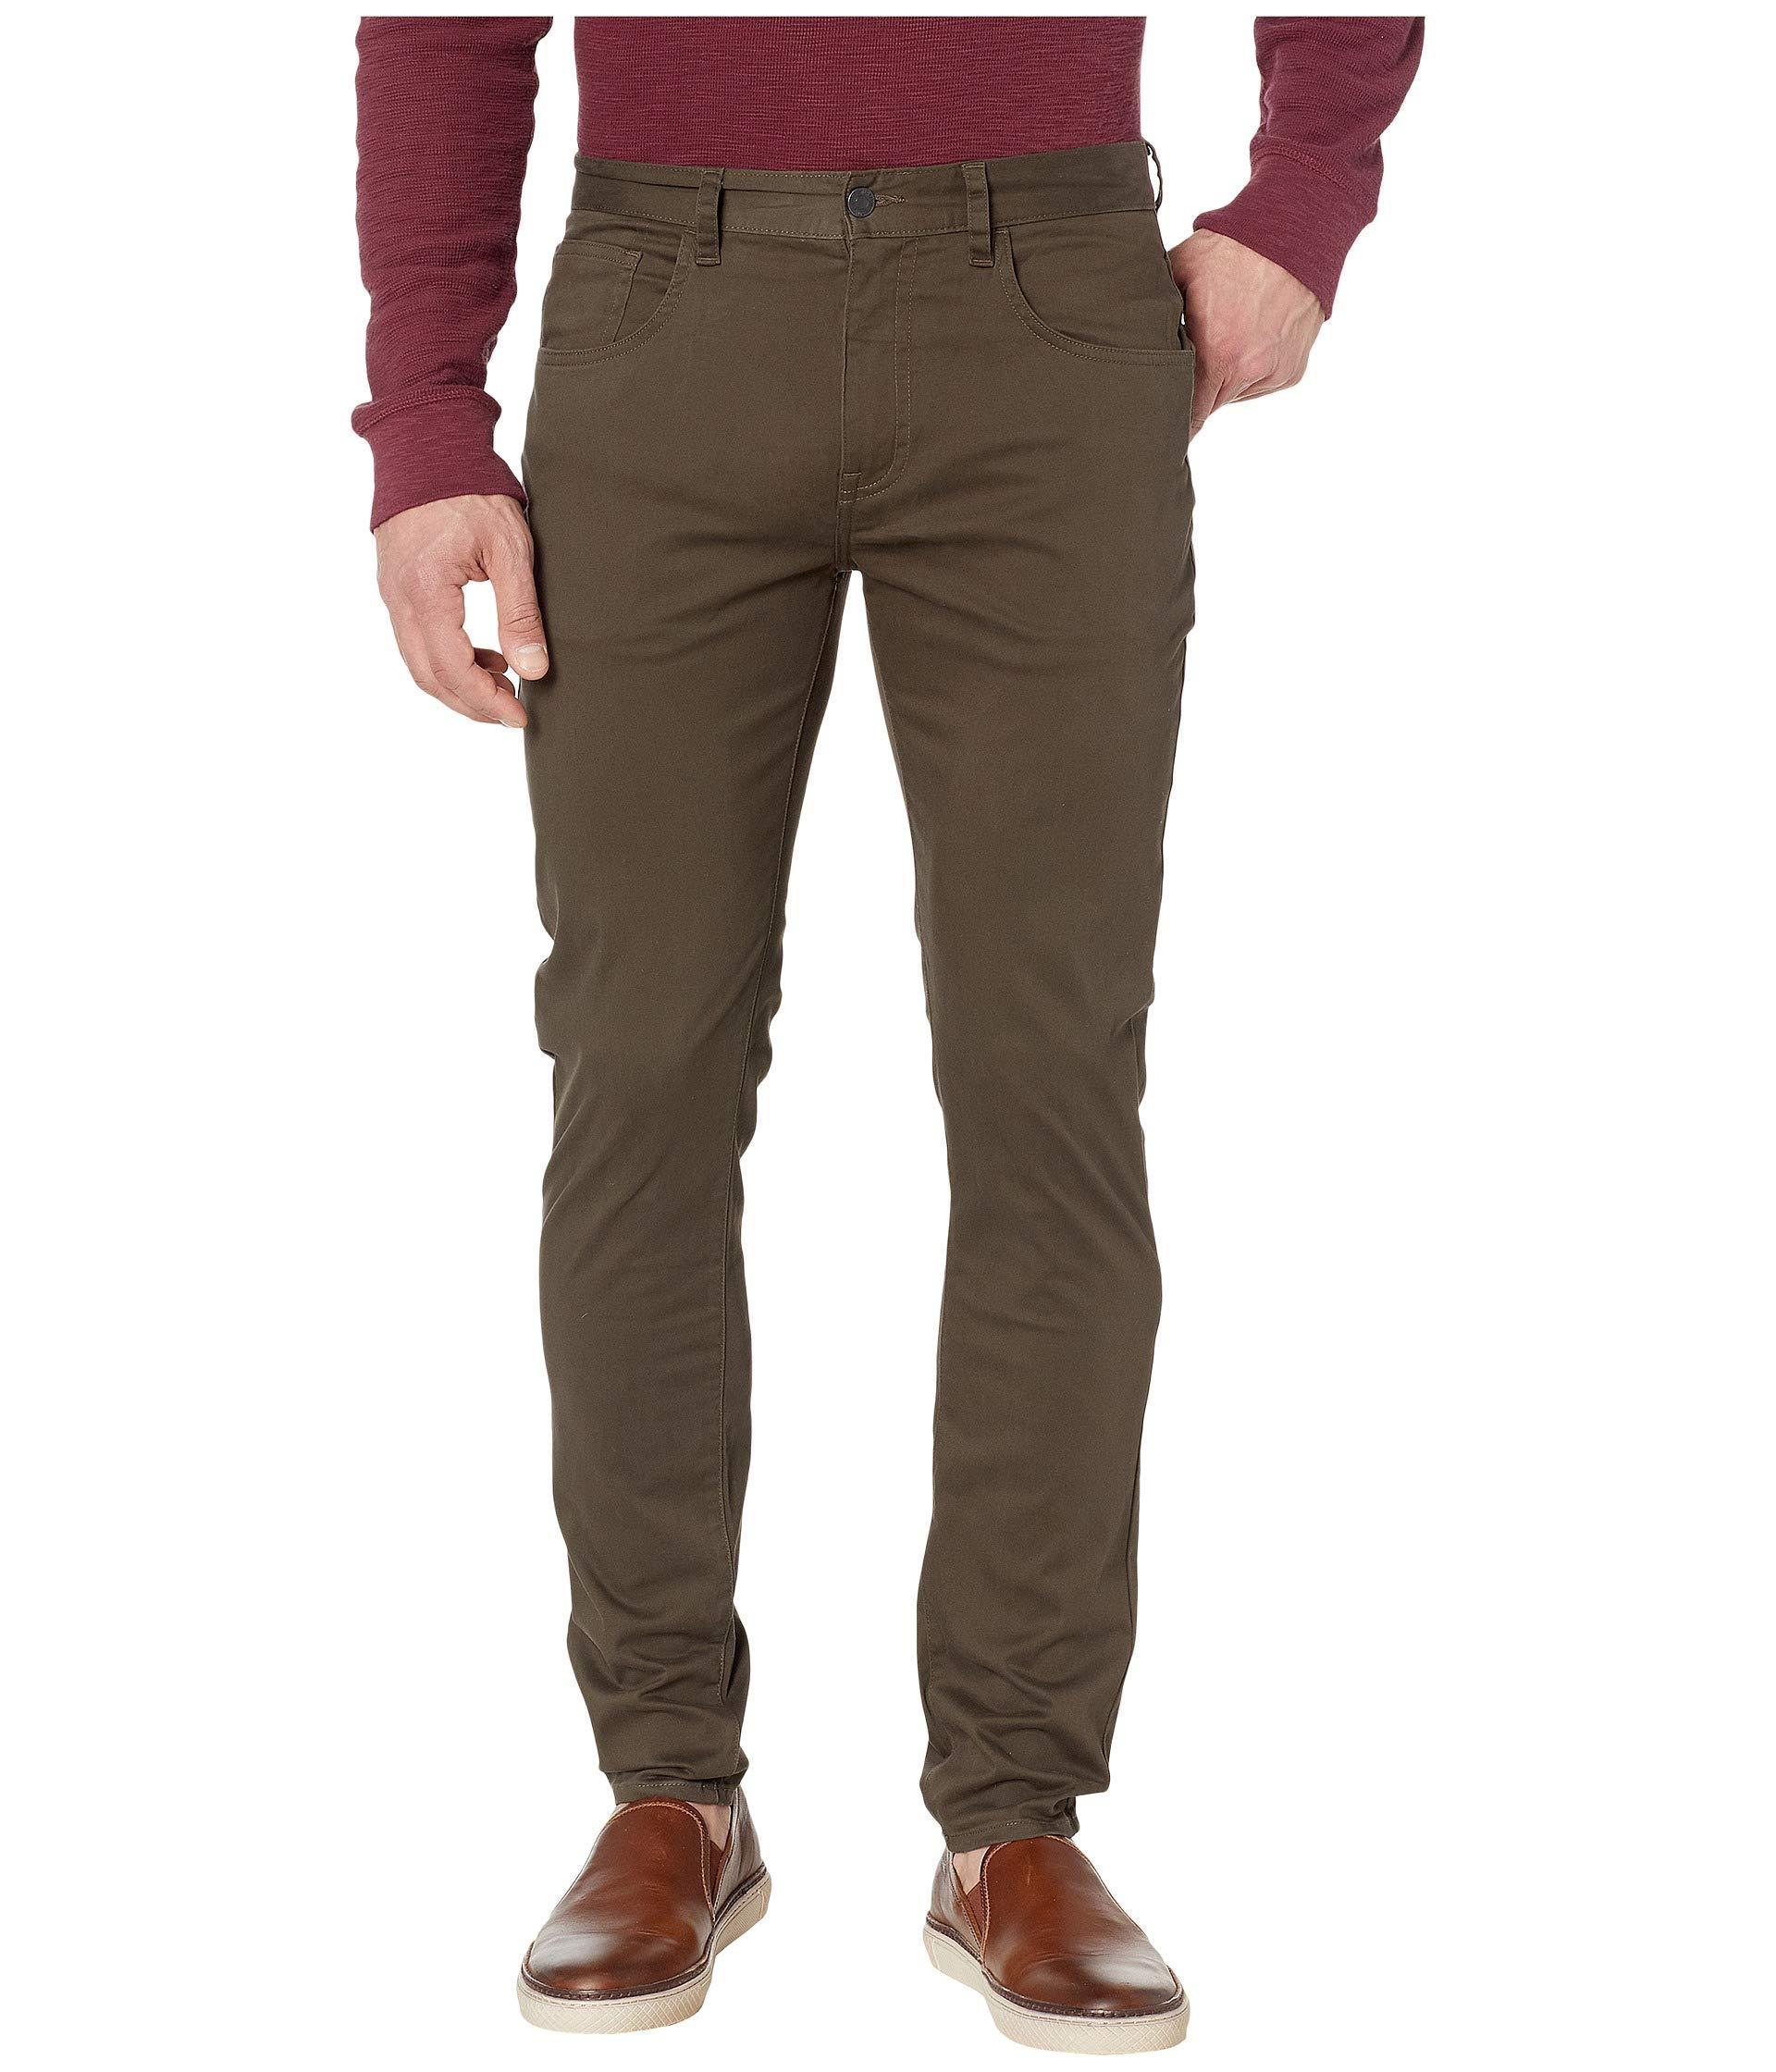 Ben Sherman Mens Five-Pocket Chino Pant